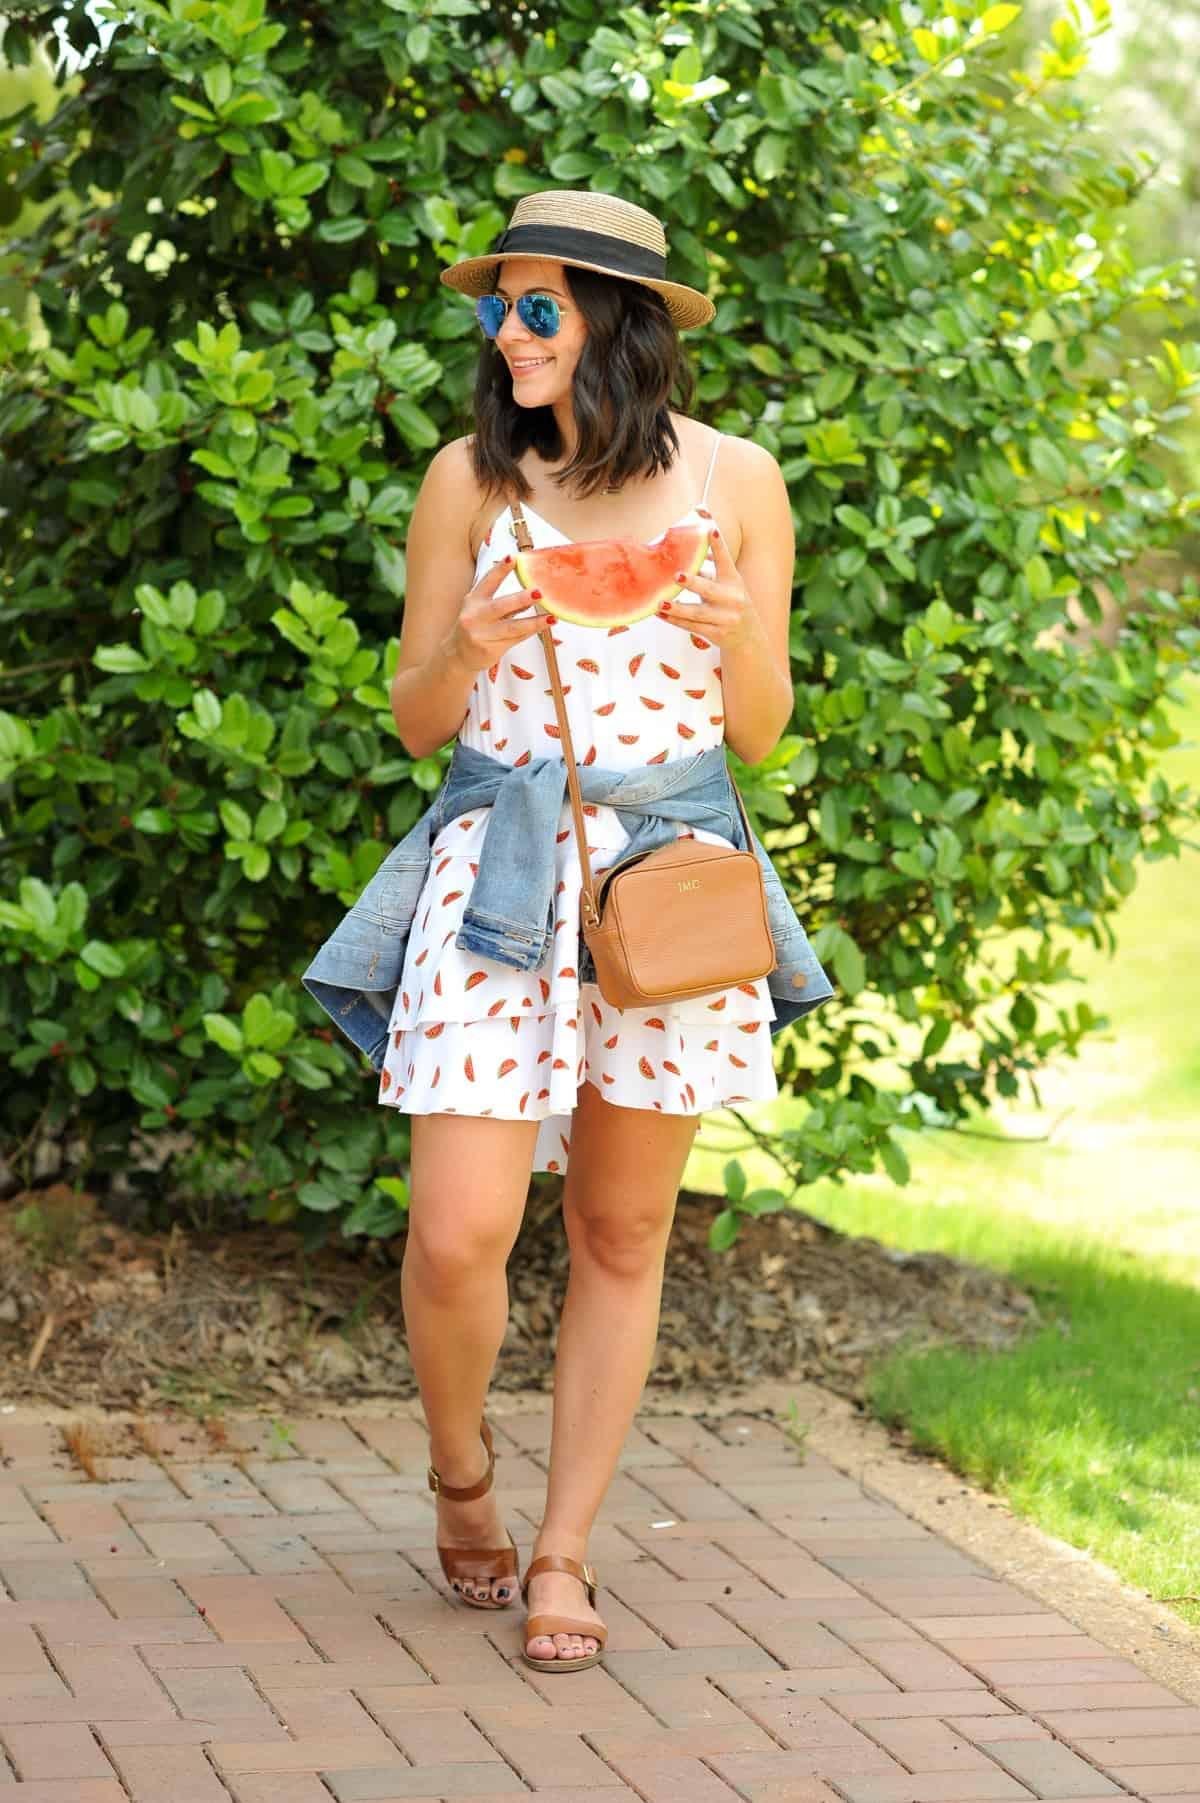 Cooper and Ella watermelon dress - summer outfit ideas - My Style Vita @mystylevita